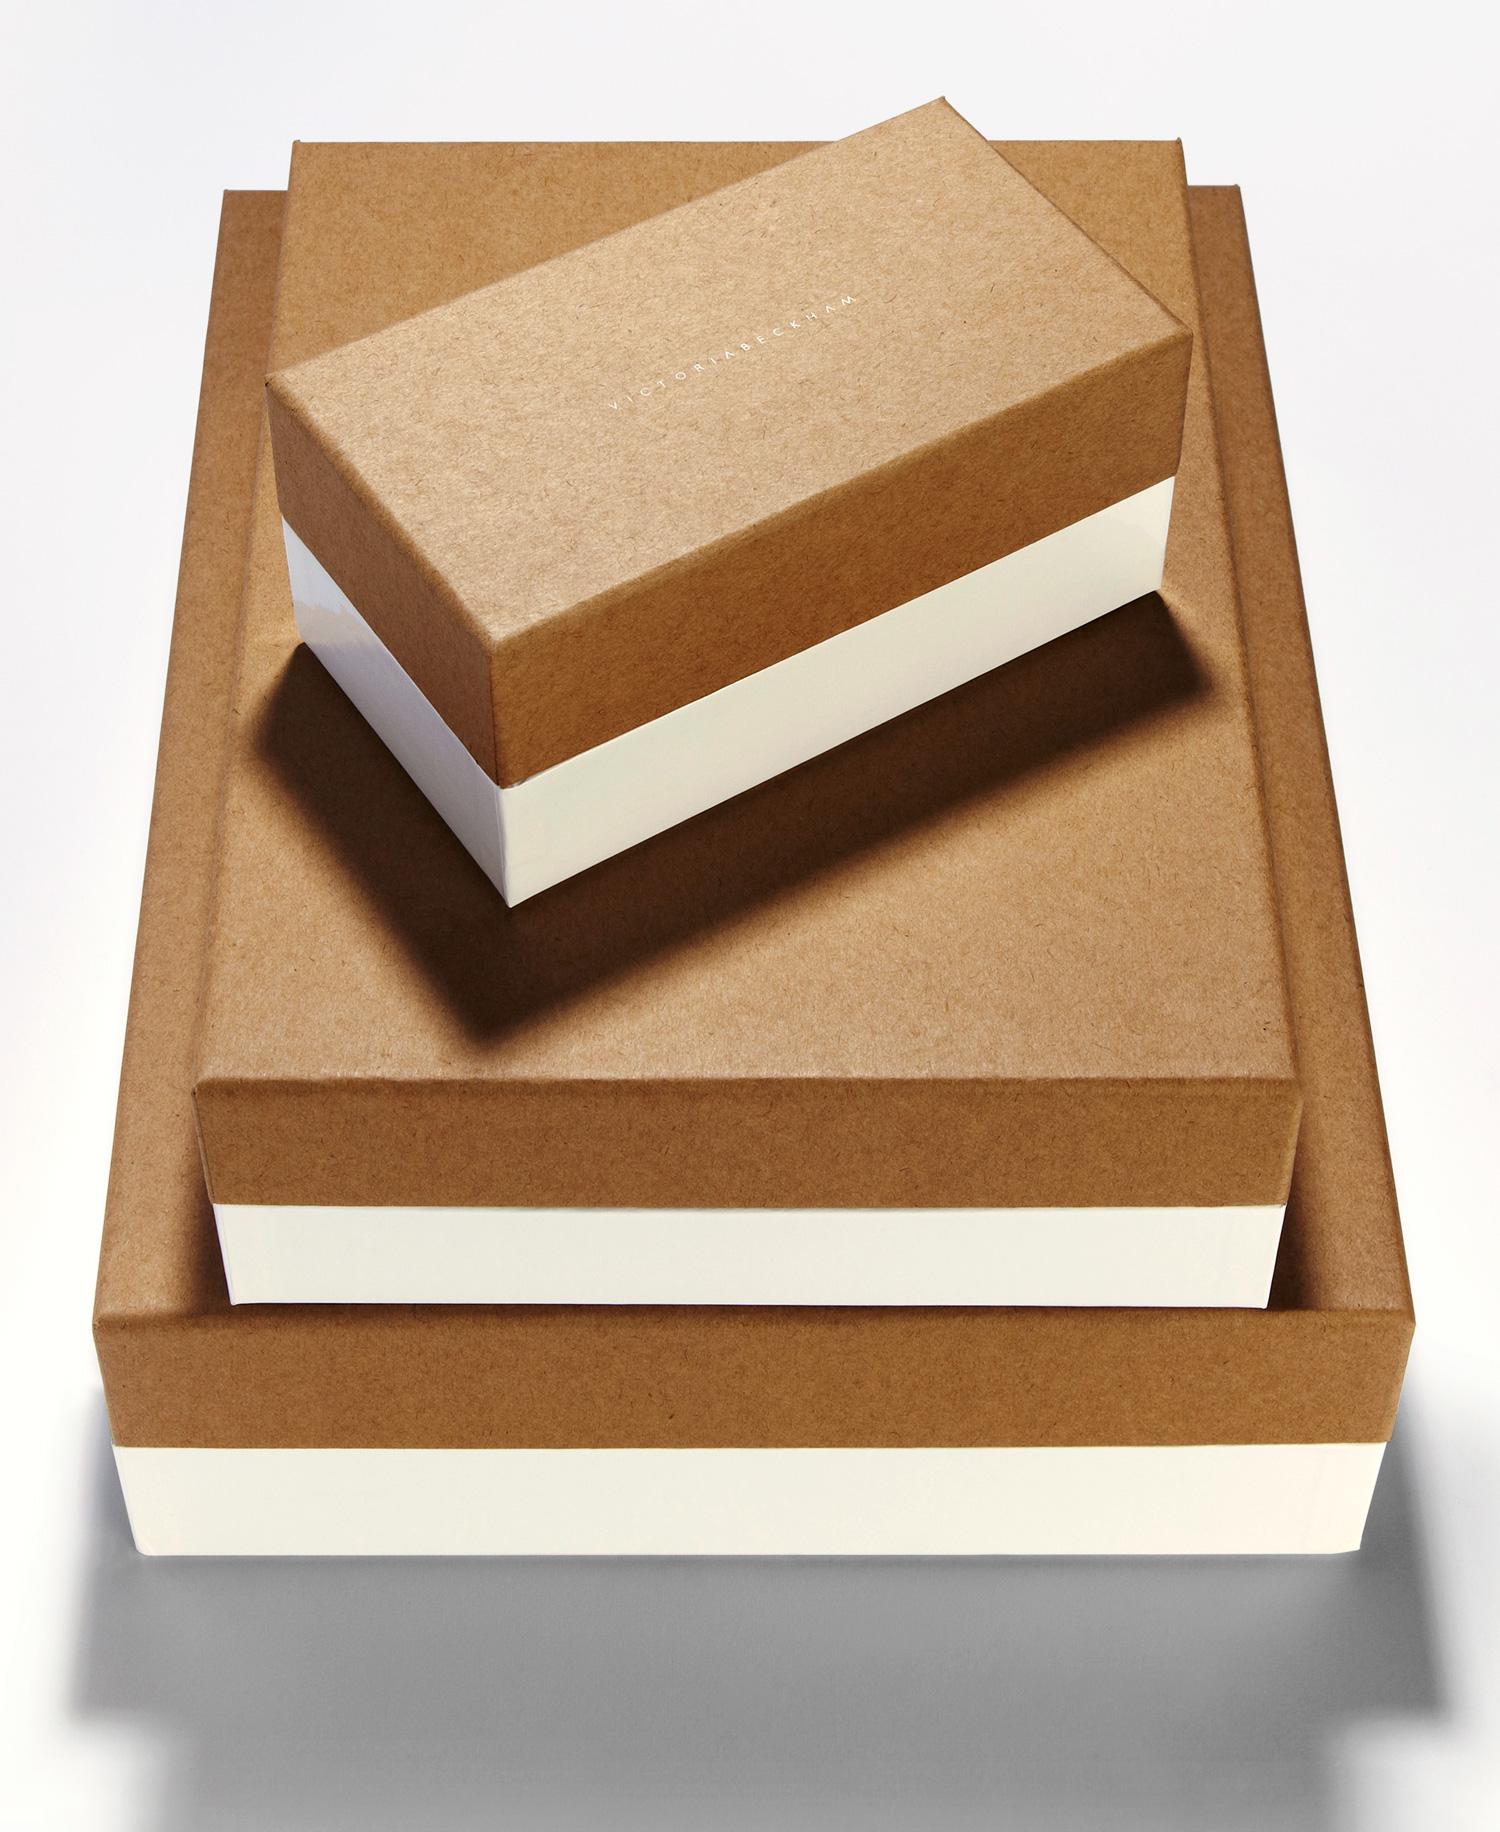 Progress Packaging Victoria Beckham Luxury Fashion Boxes Range Boxes Eccomerce